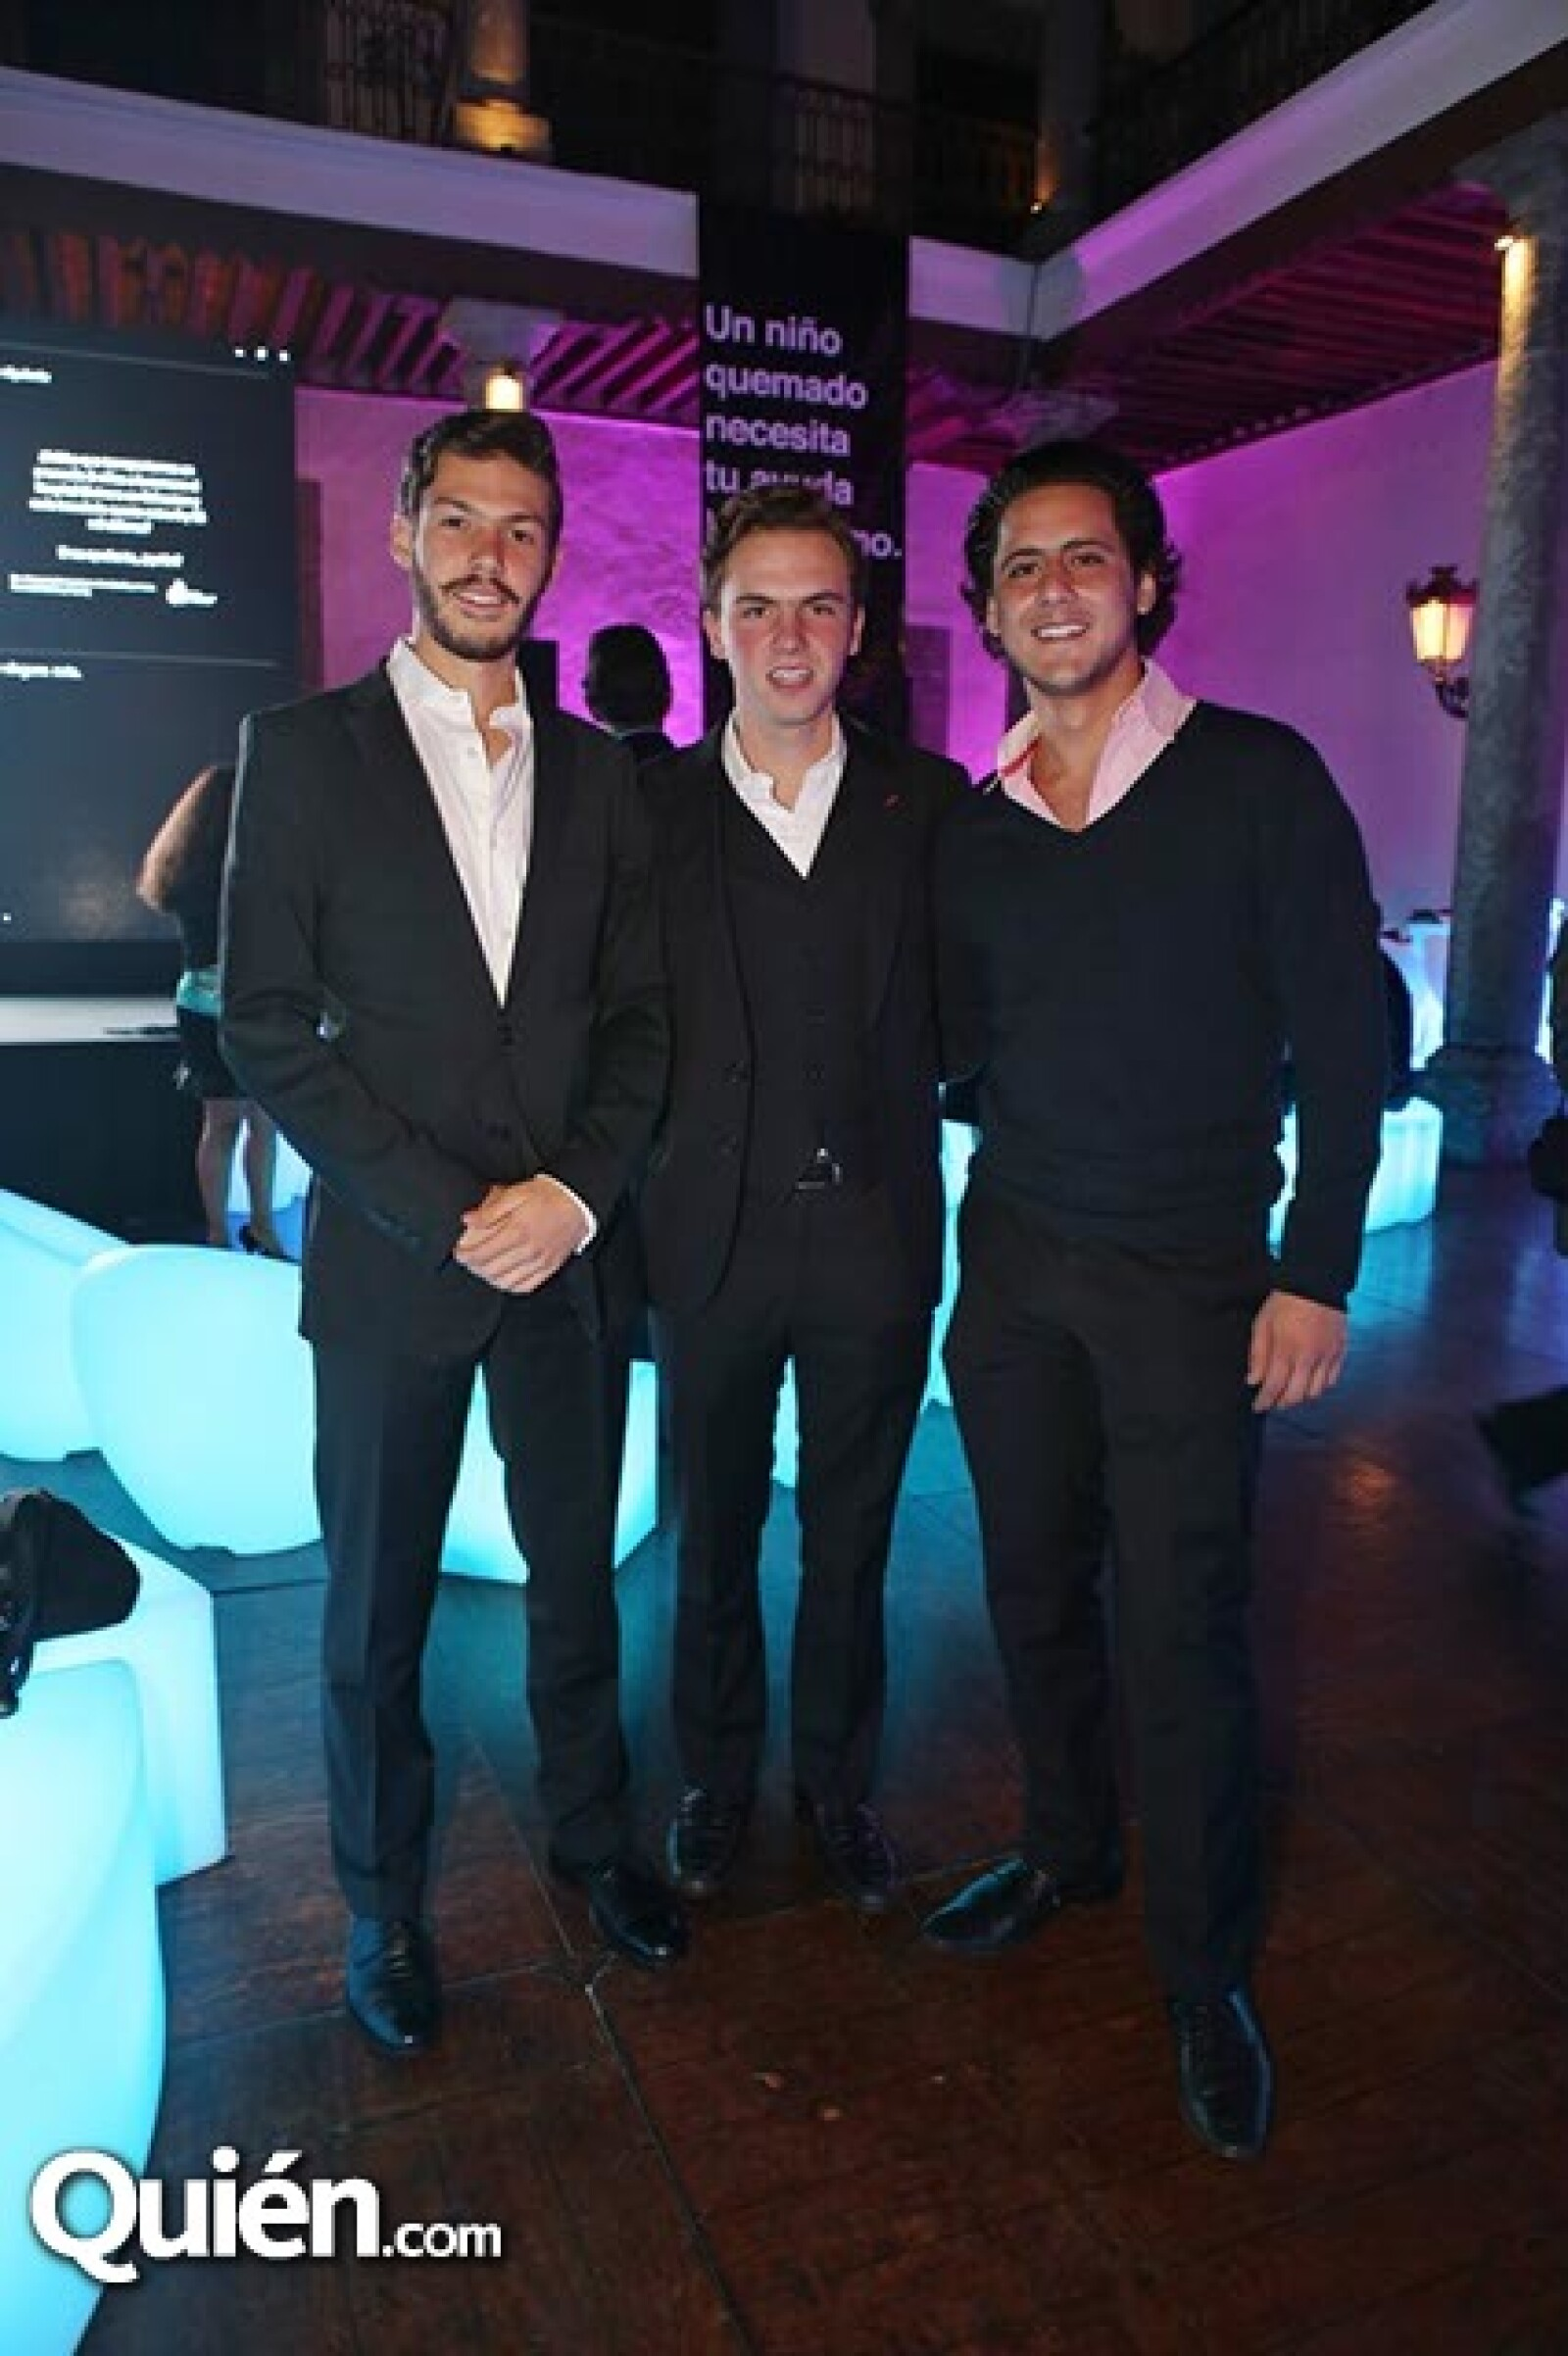 Diego Cerrilla,Íñigo Fernández y Daniel Mussi